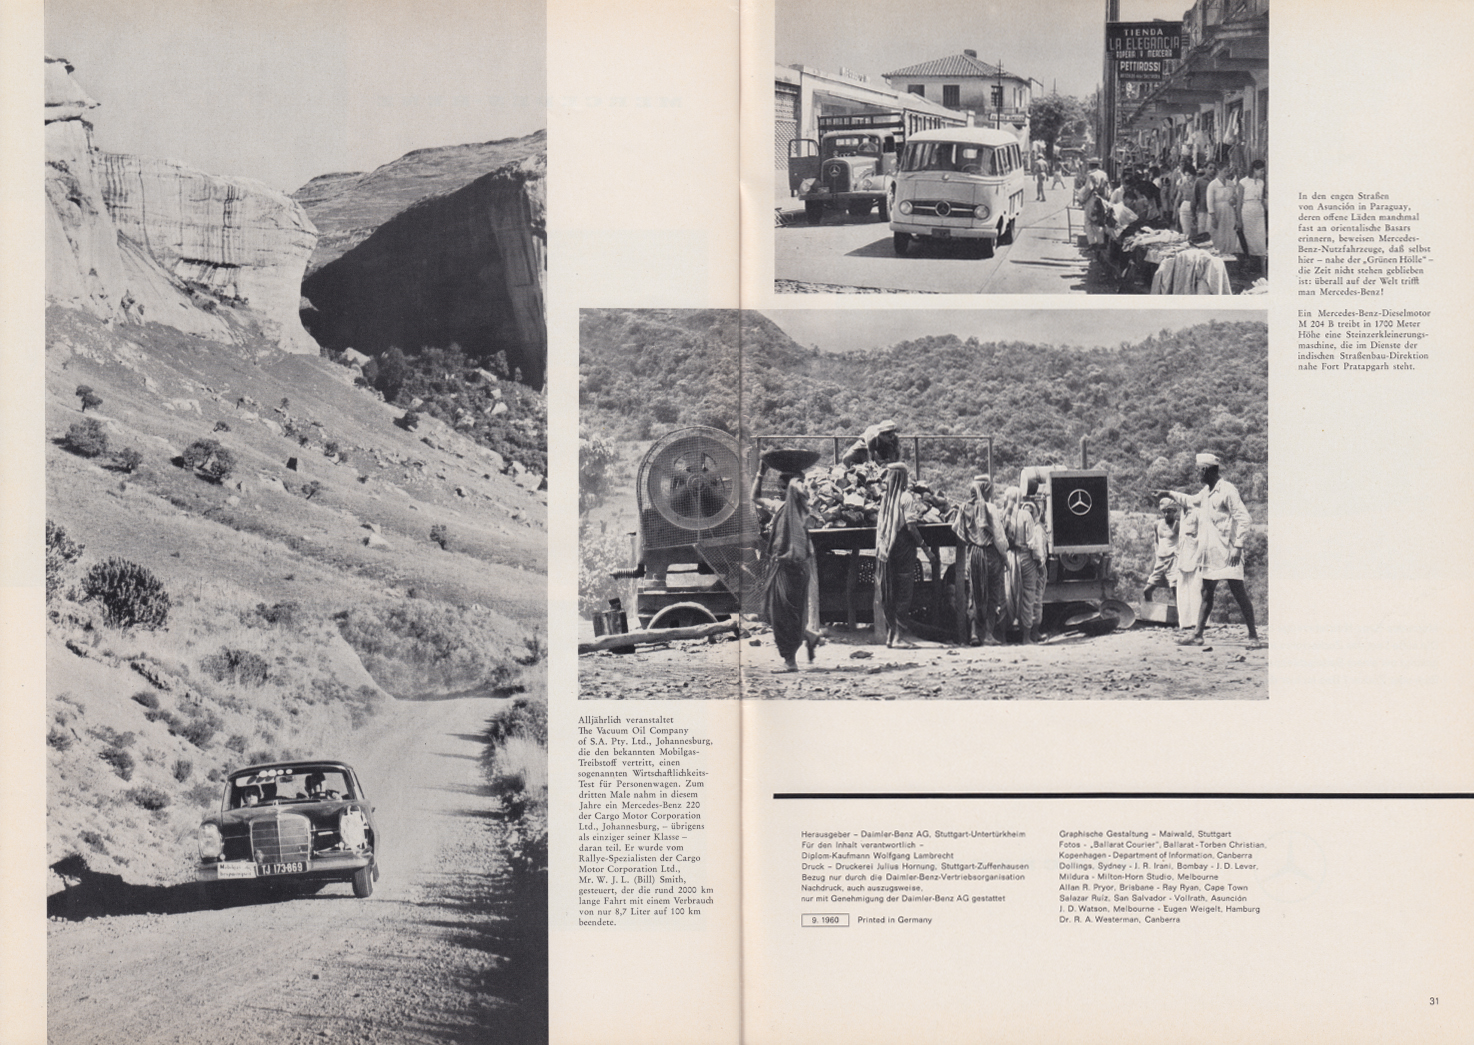 (REVISTA): Periódico In aller welt n.º 44 - Mercedes-Benz no mundo - 1960 - multilingue 016